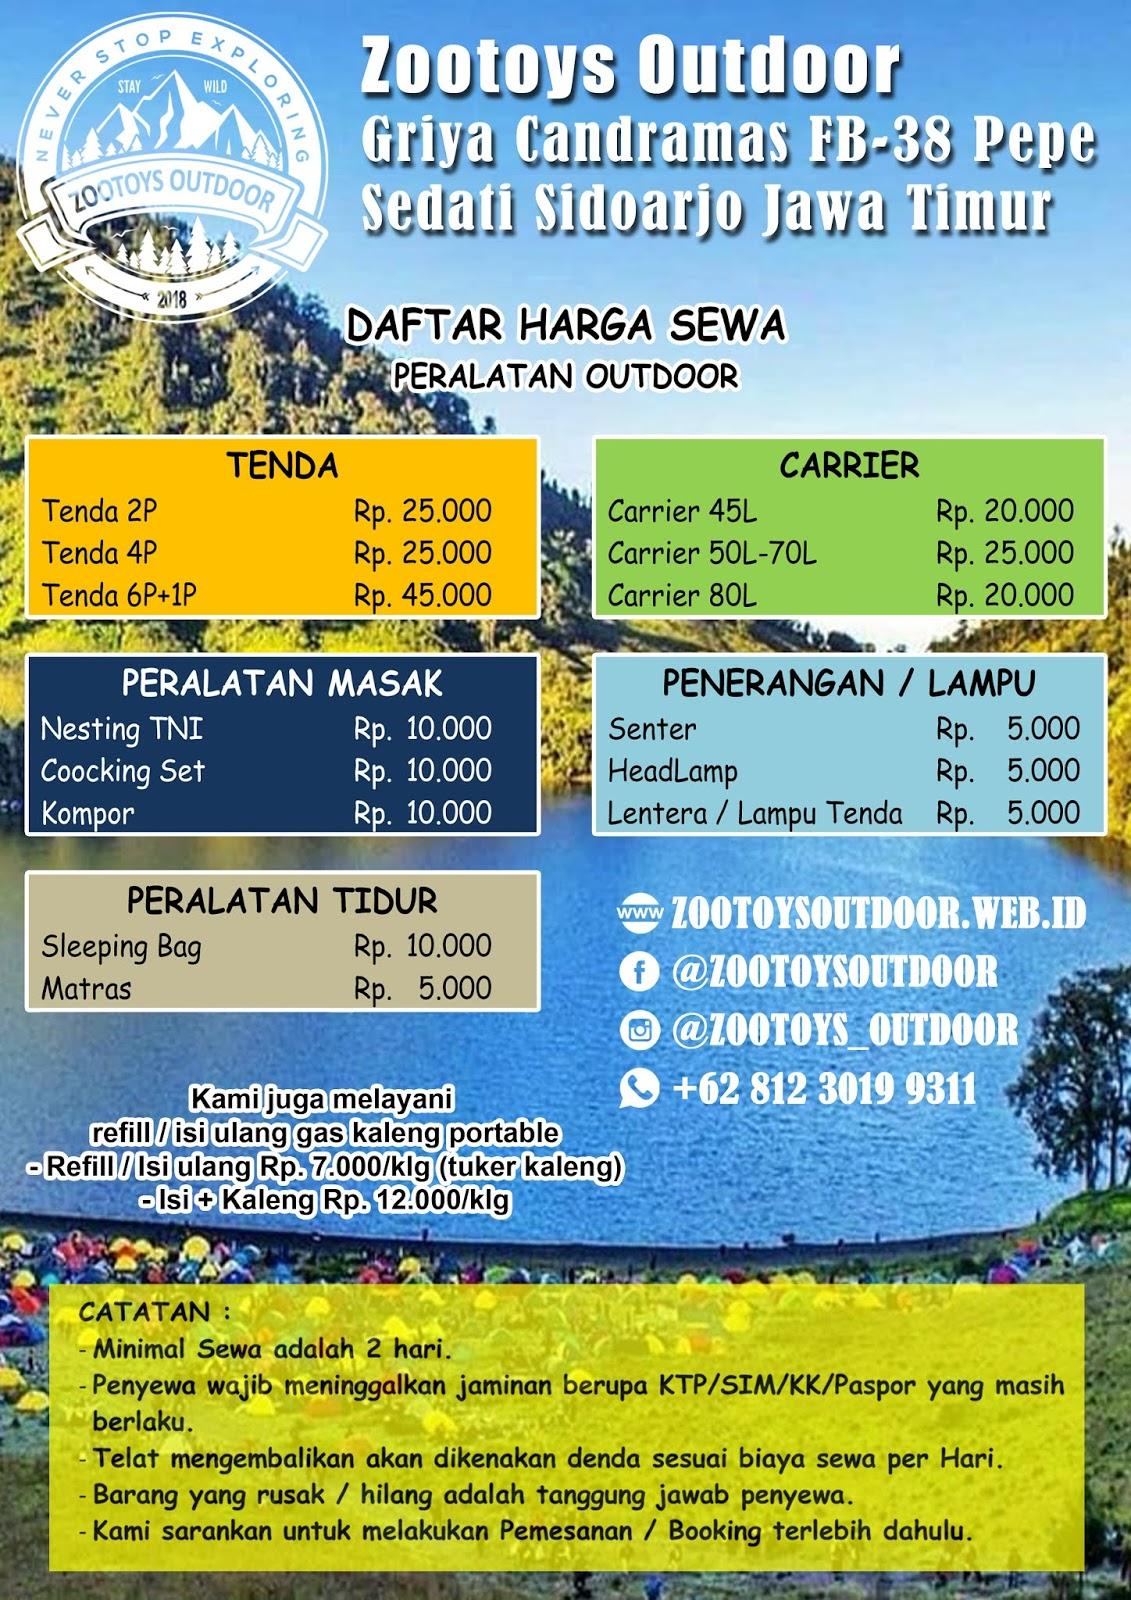 Daftar Harga Zootoys Outdoor Rental Alat Outdoor Hiking Sidoarjo Surabaya Sewa Alat Camping Tenda Dome